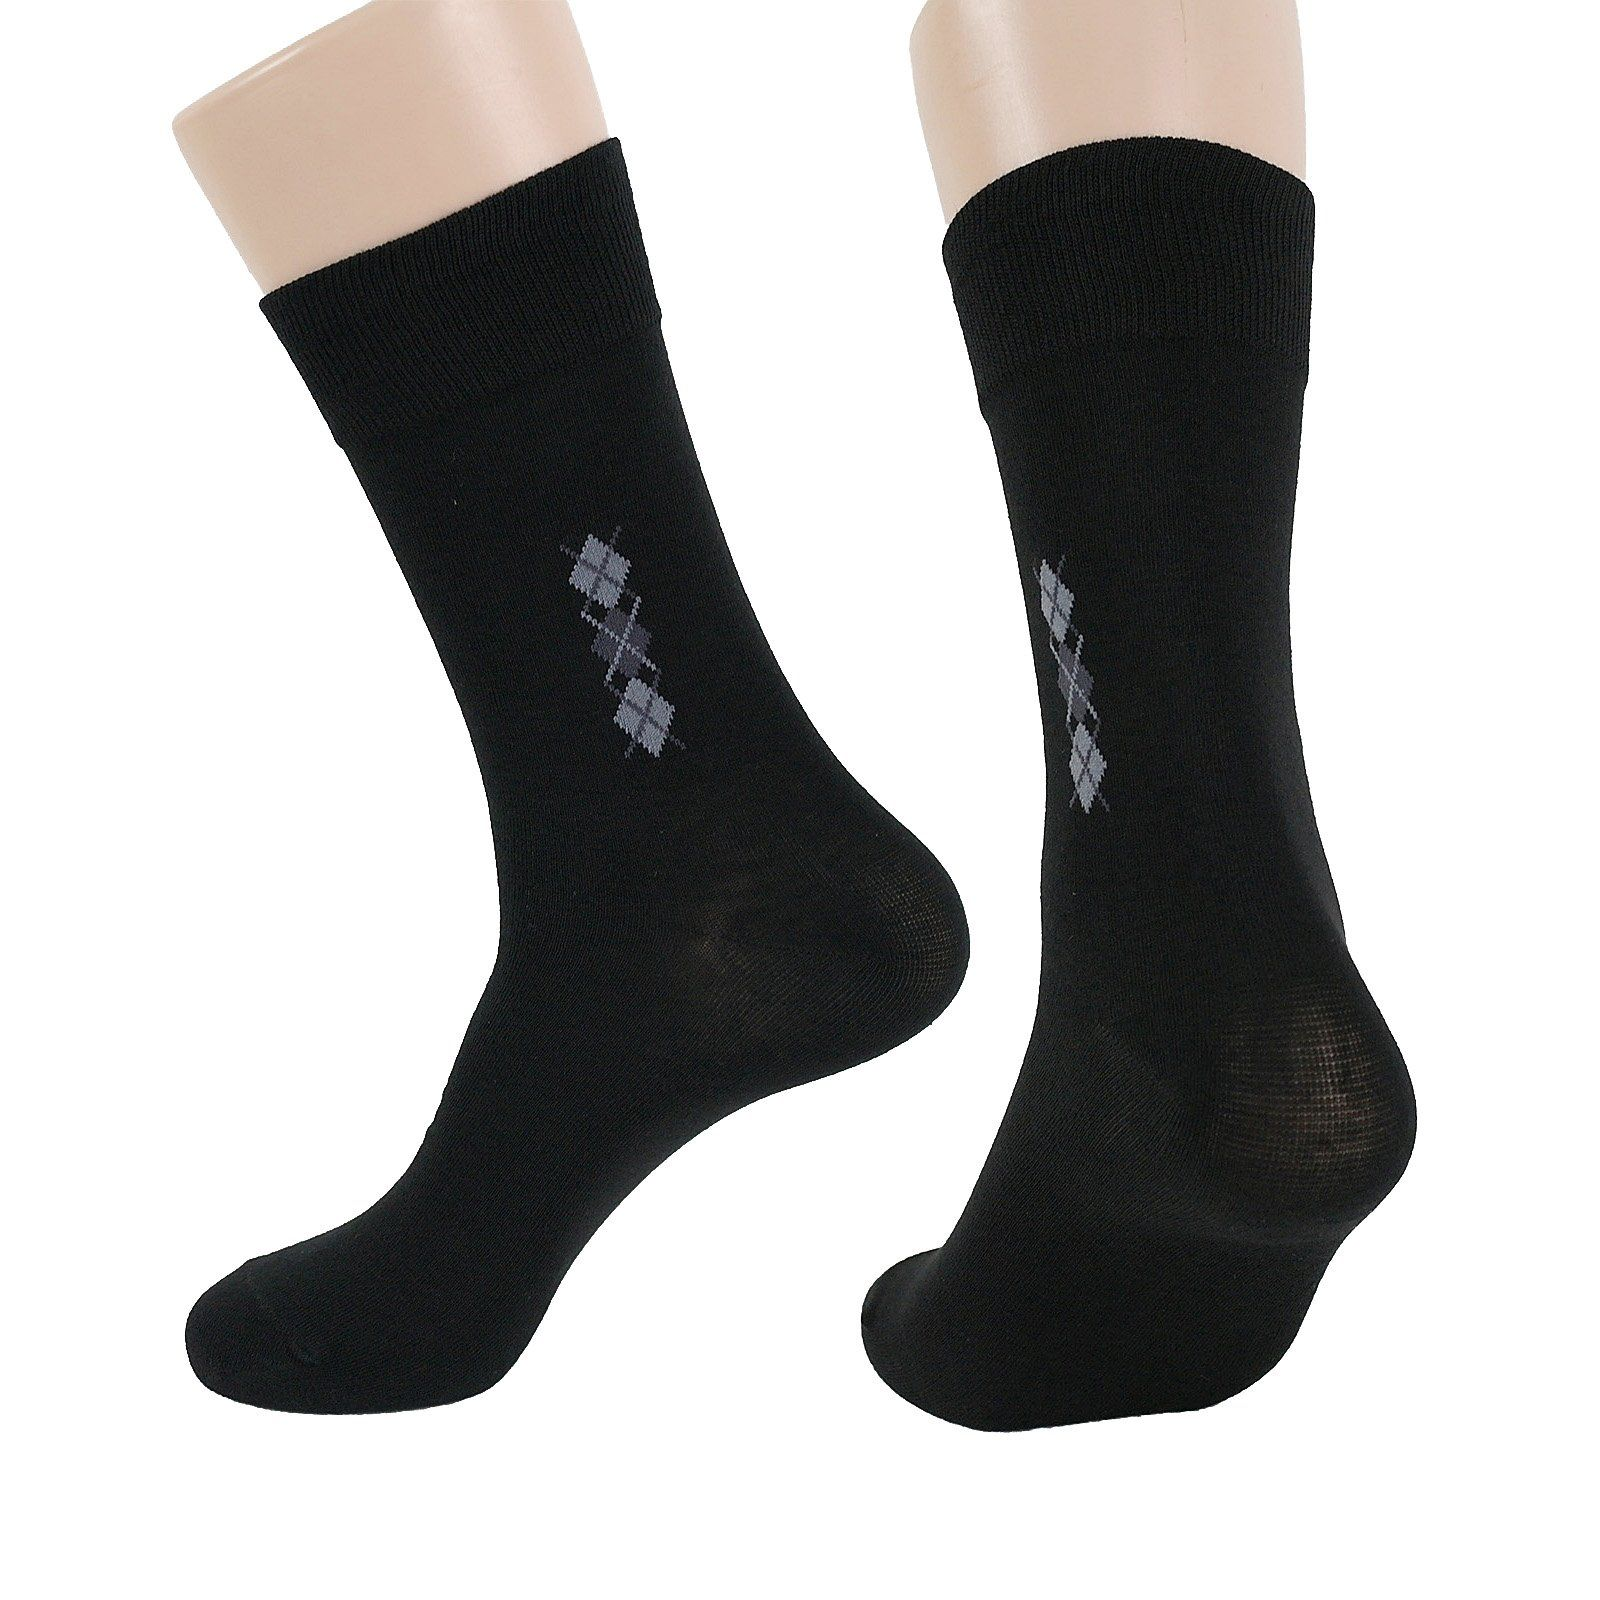 Mens Business Classics Dress Crew Socks 5 Pairs Black With Diamond 5pairs See This Great Product It Is Amazon Affiliate L Crew Socks Mens Dress Socks Socks [ 1600 x 1600 Pixel ]